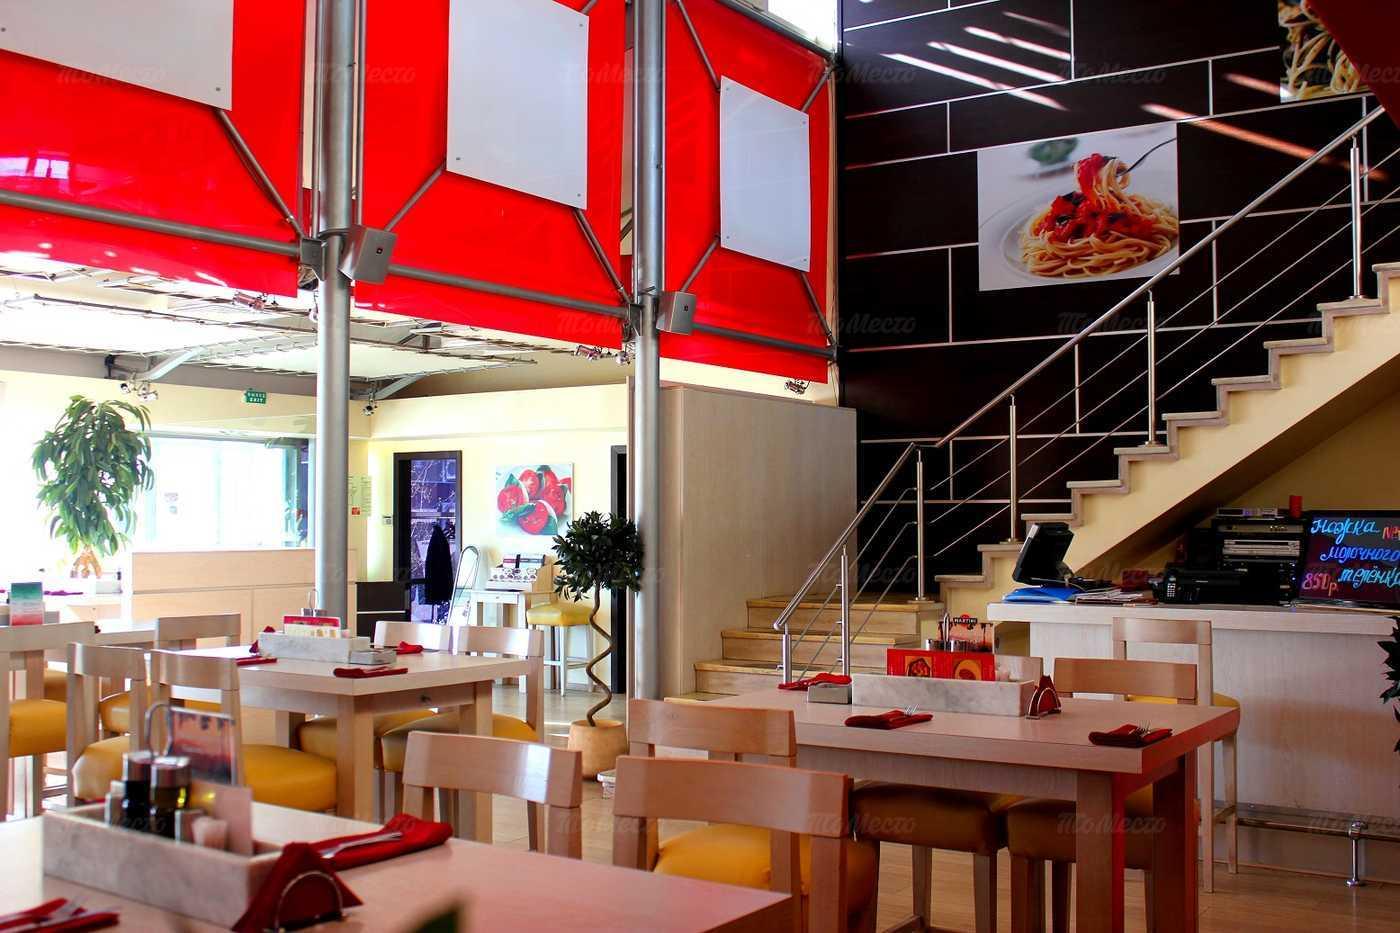 Меню кафе, ресторана Вапиано (Vapiano) на проспекте Вернадского